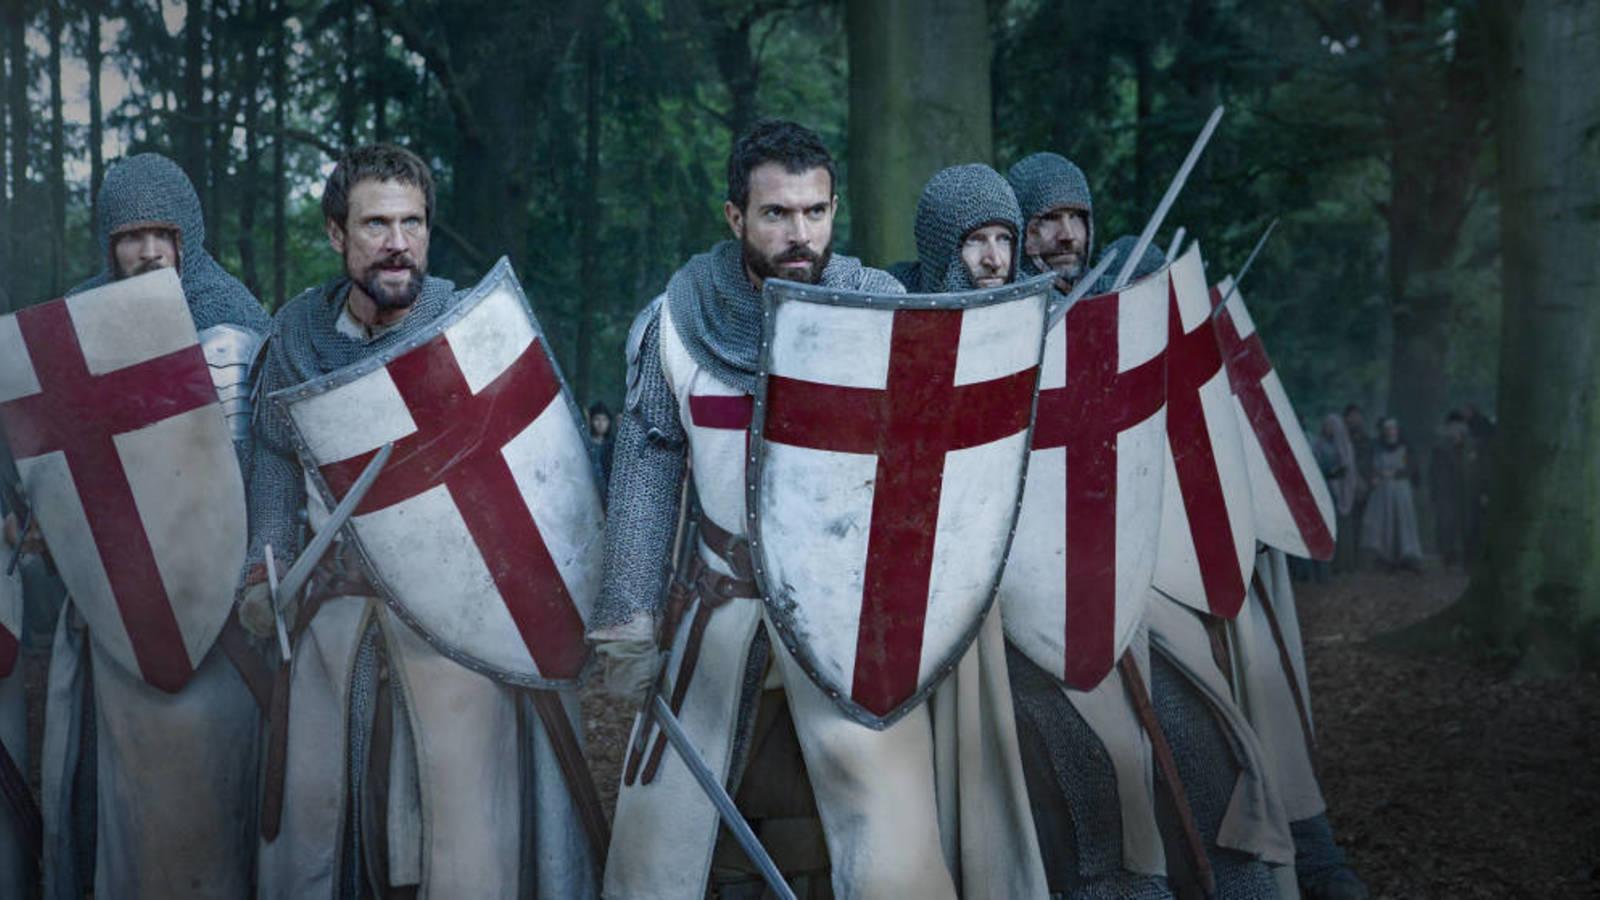 nuevo-trailer-de-knightfall-la-serie-mediaval-de-hbo